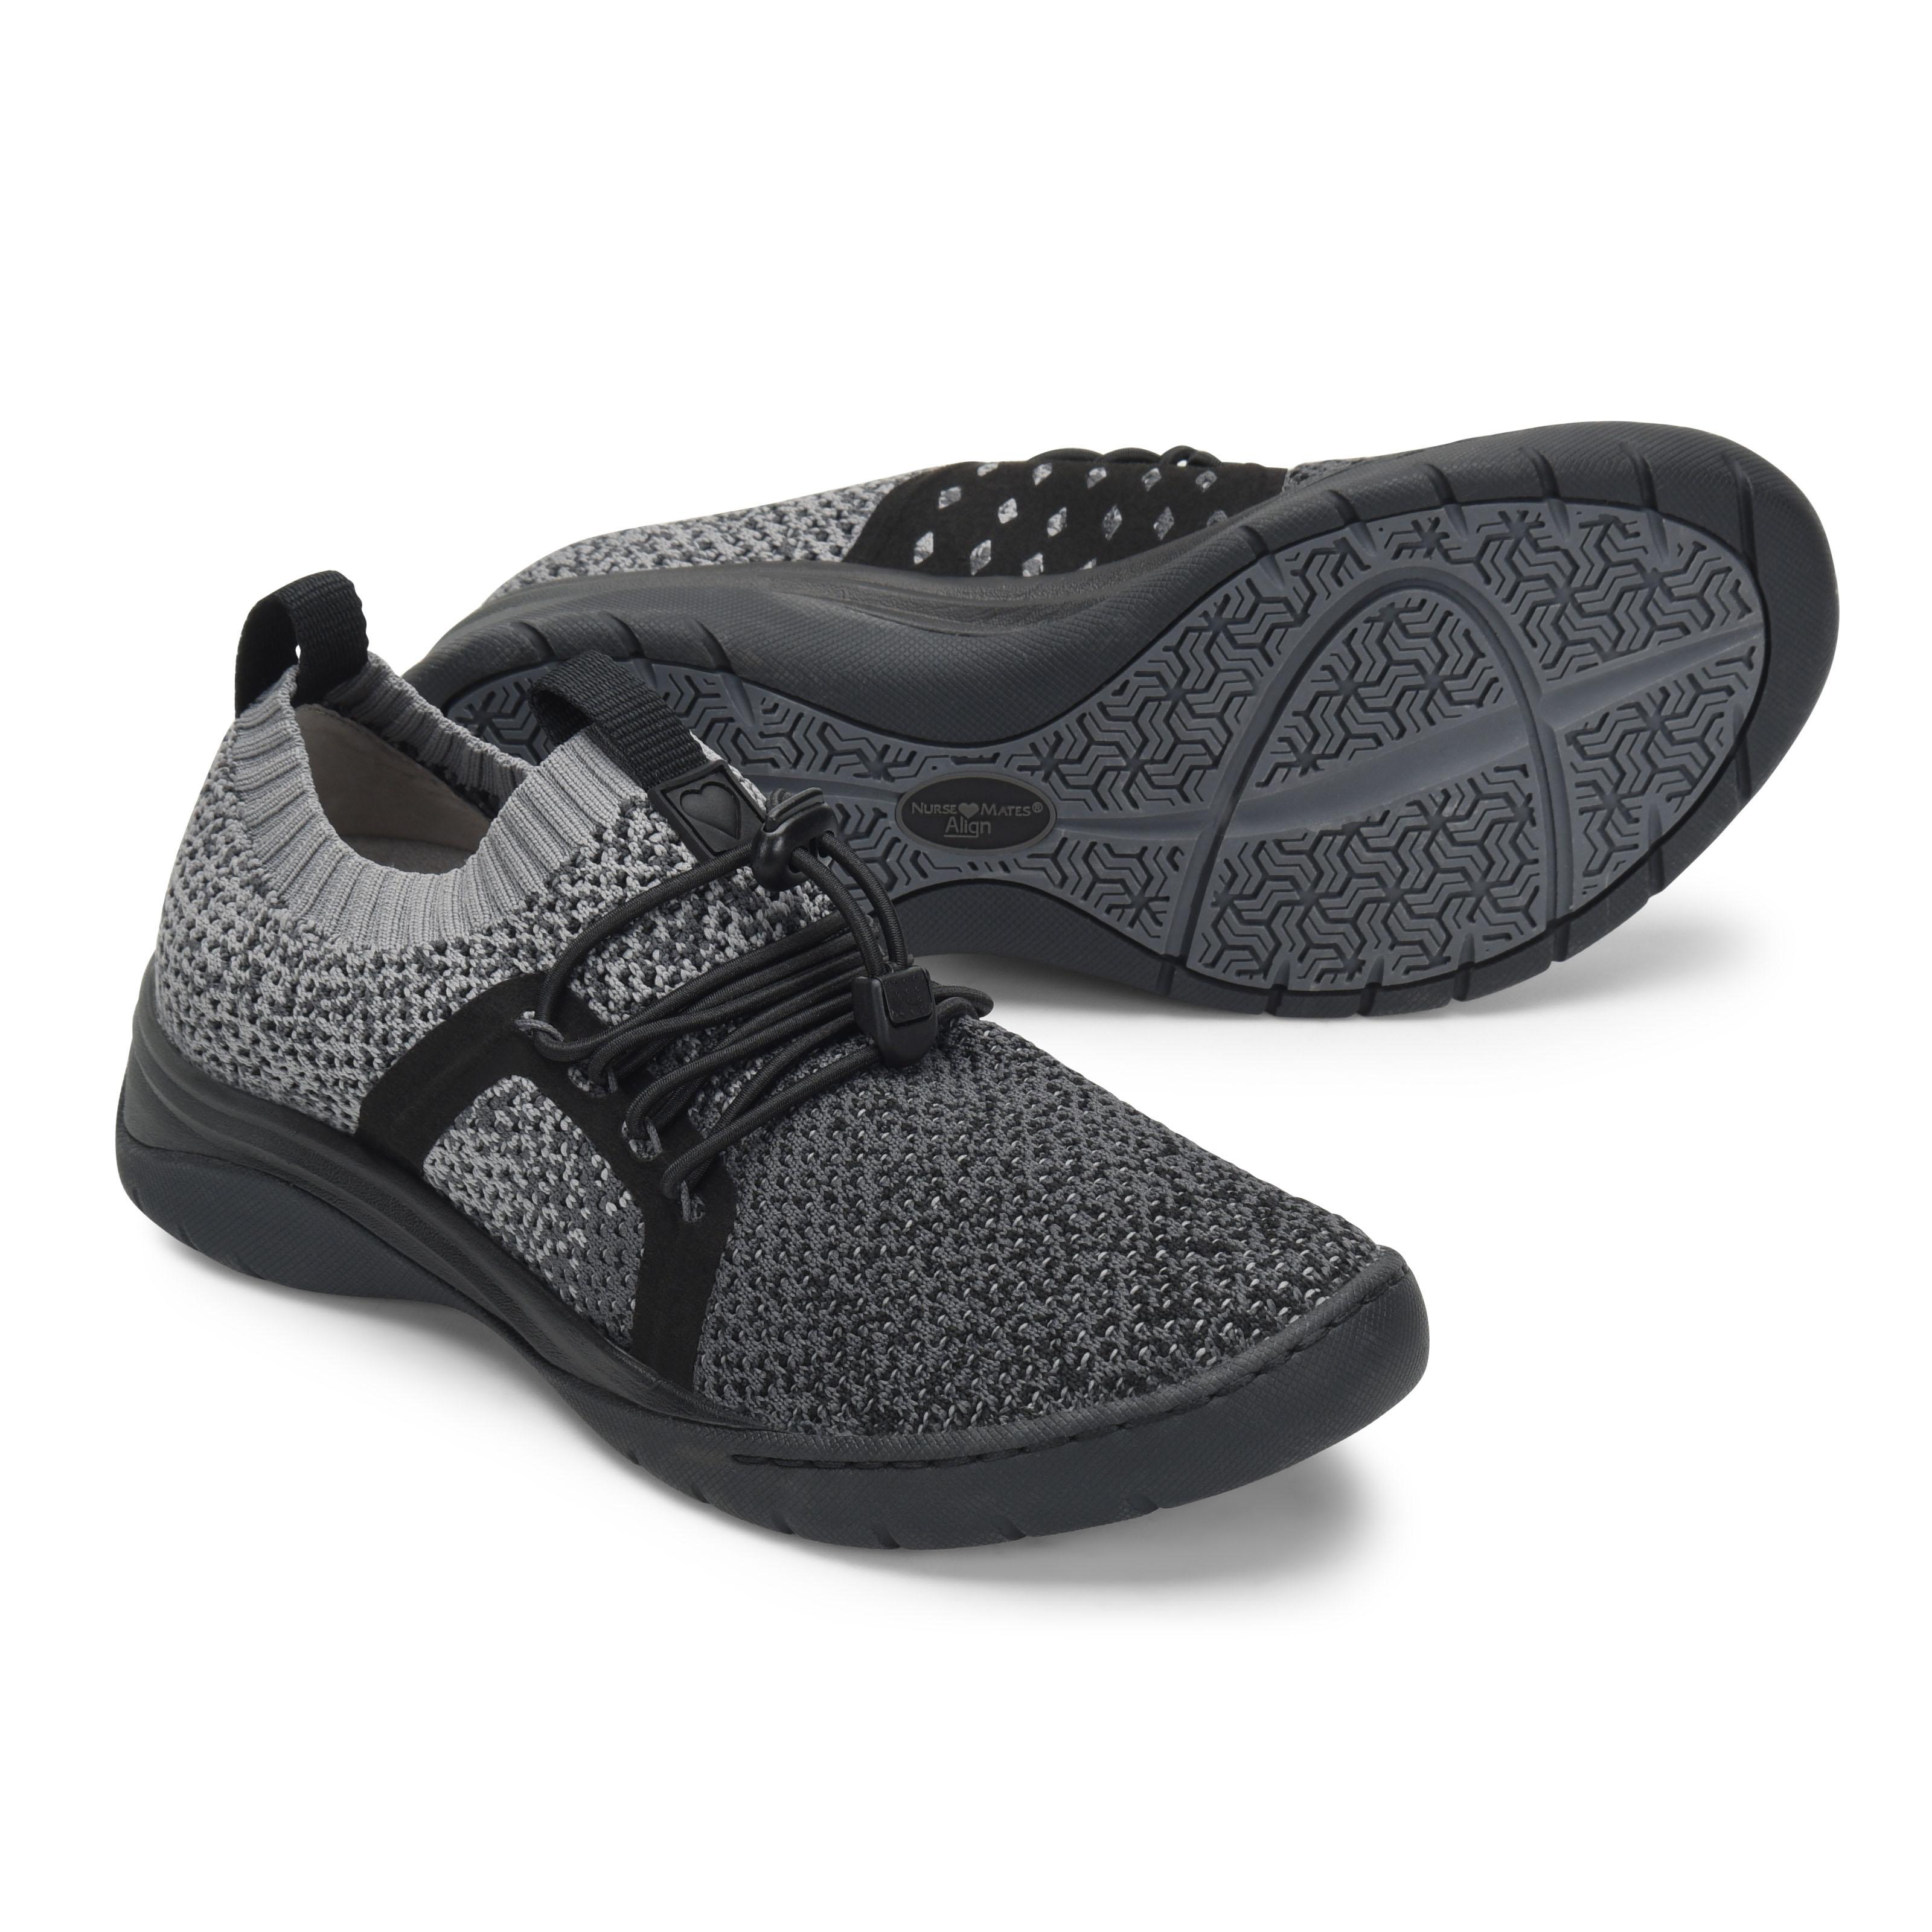 Align by Nursemates Women's Torri Shoe